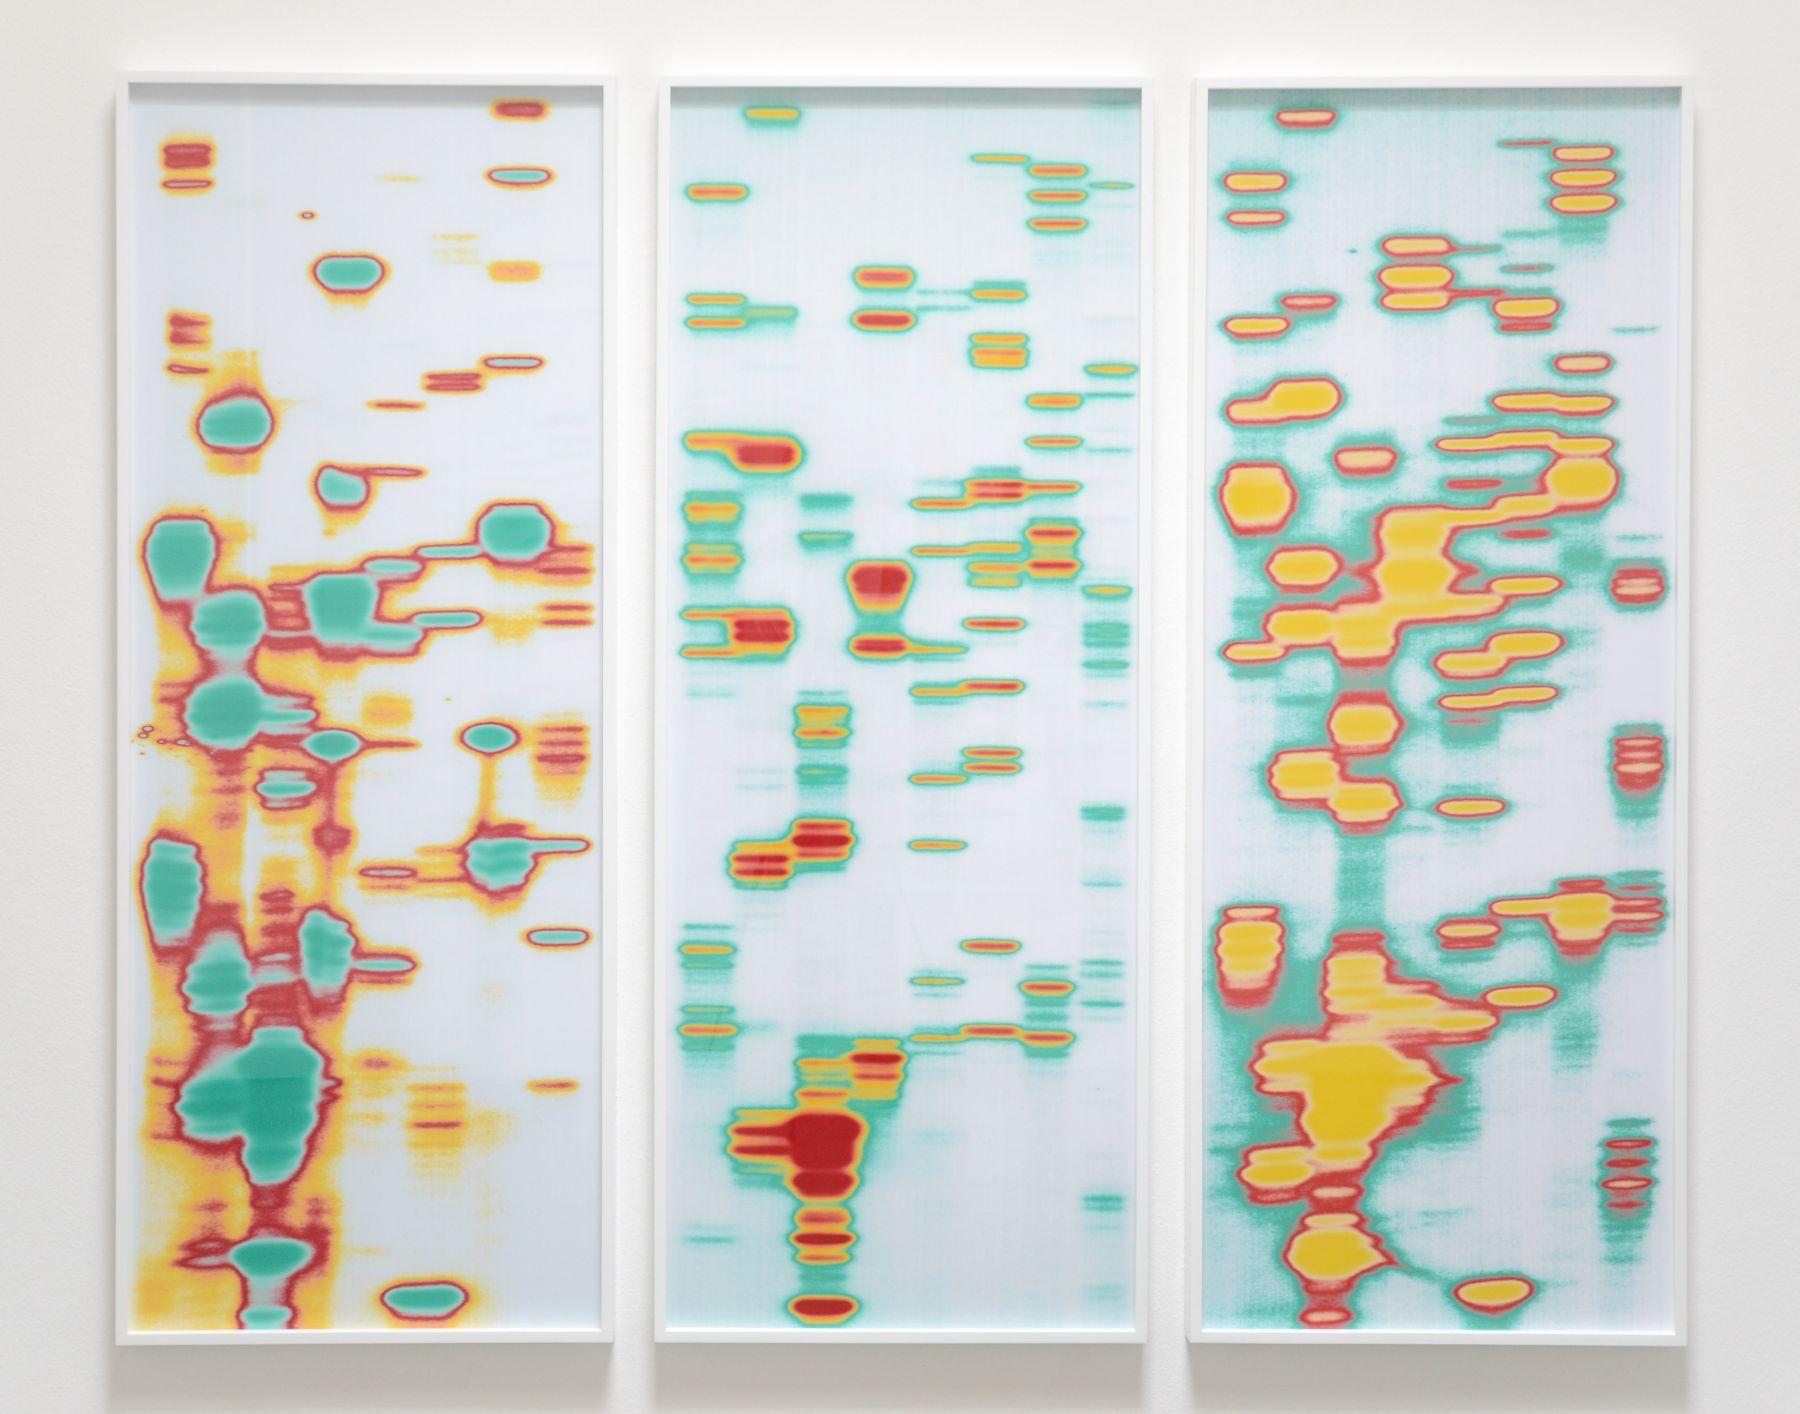 Iñigo Manglano-Ovalle, Christopher Grimes Gallery